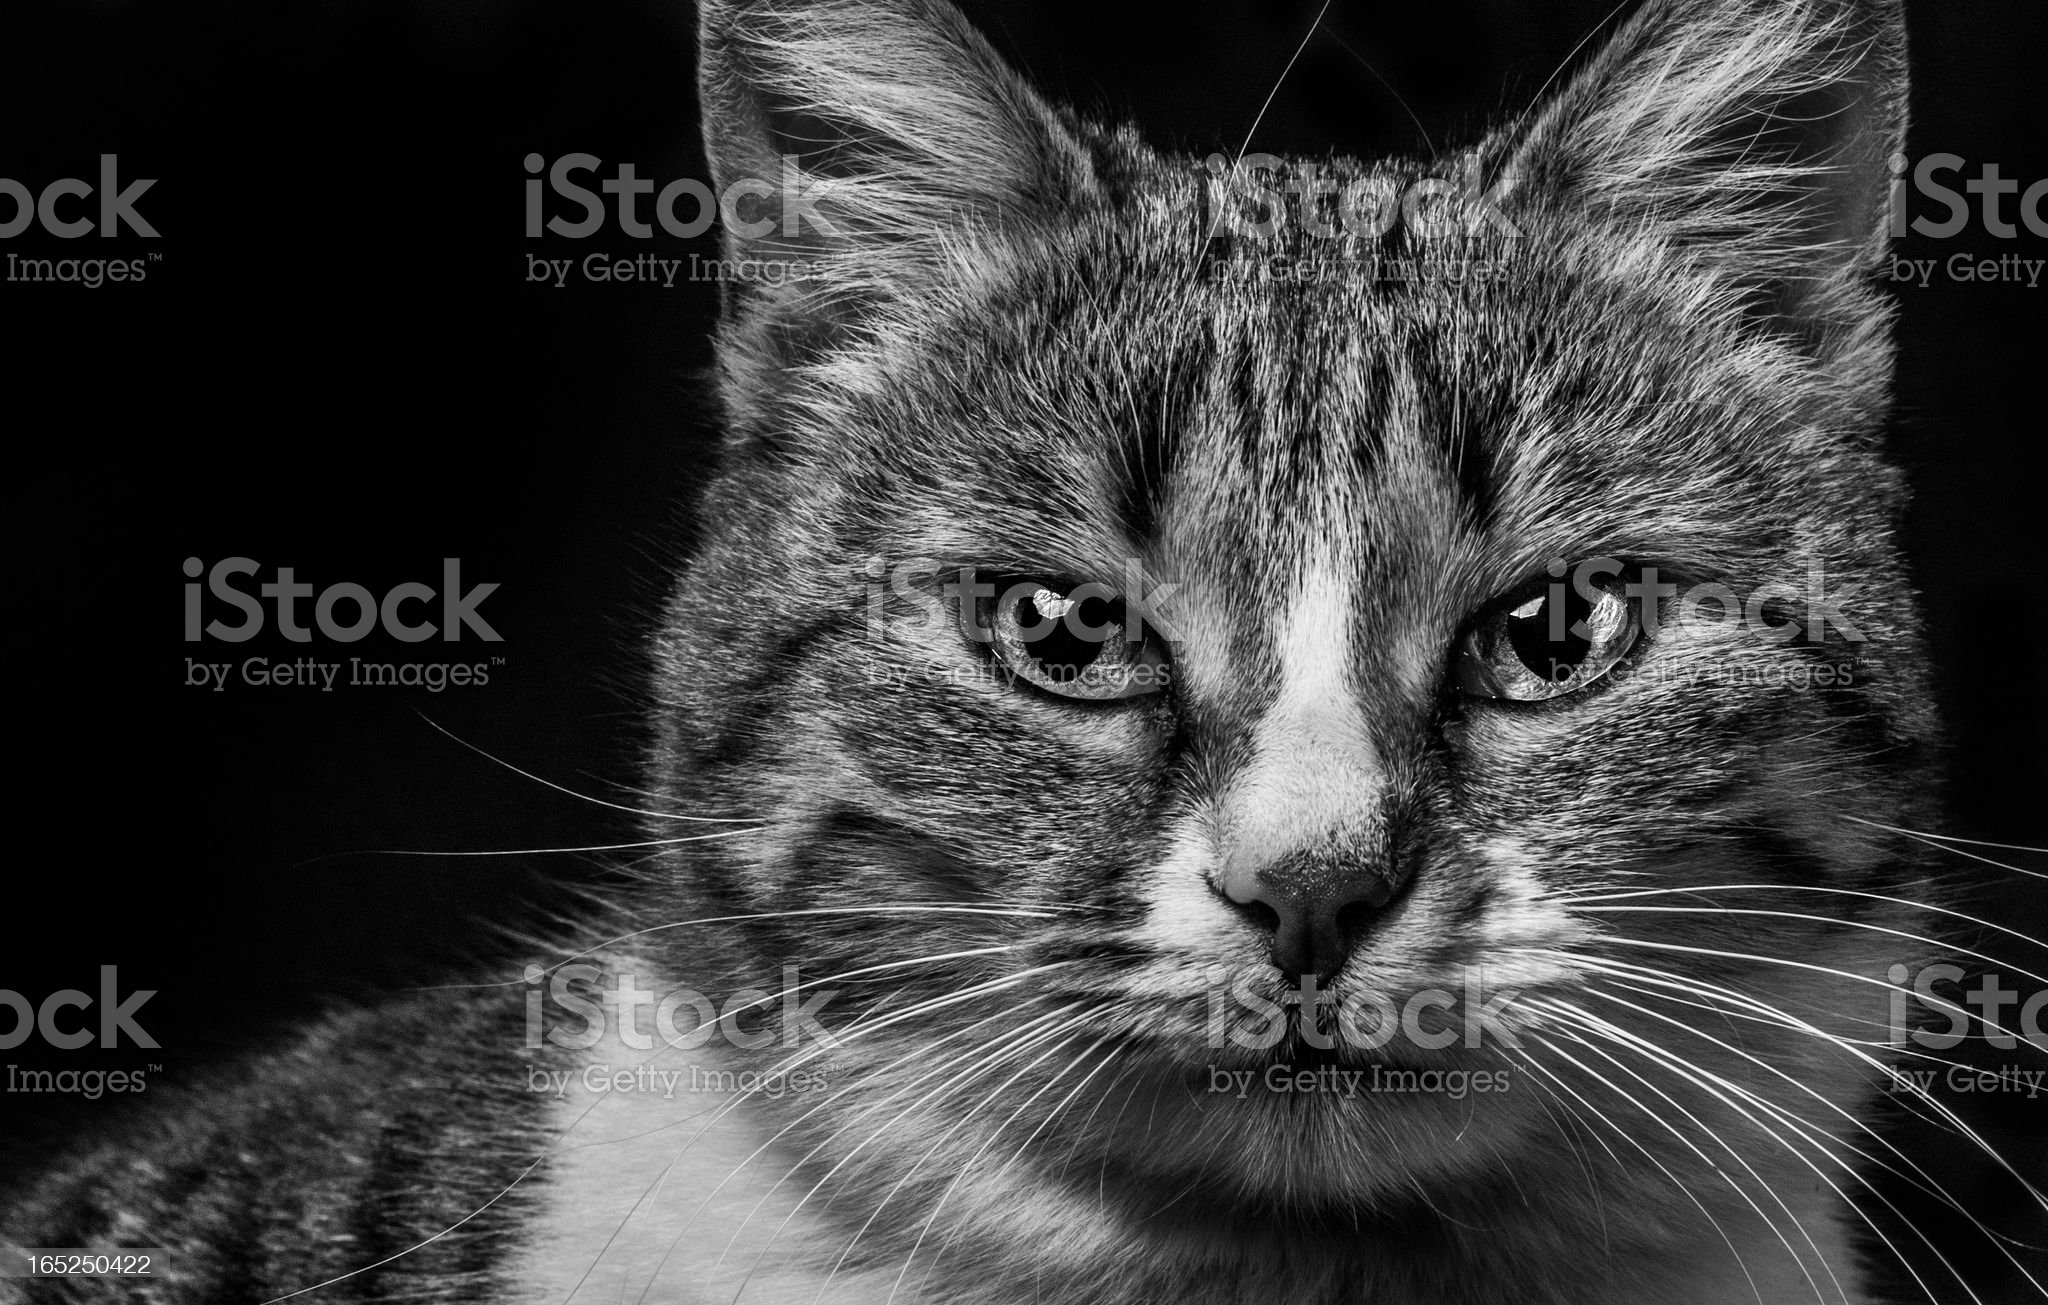 Cat on black background royalty-free stock photo